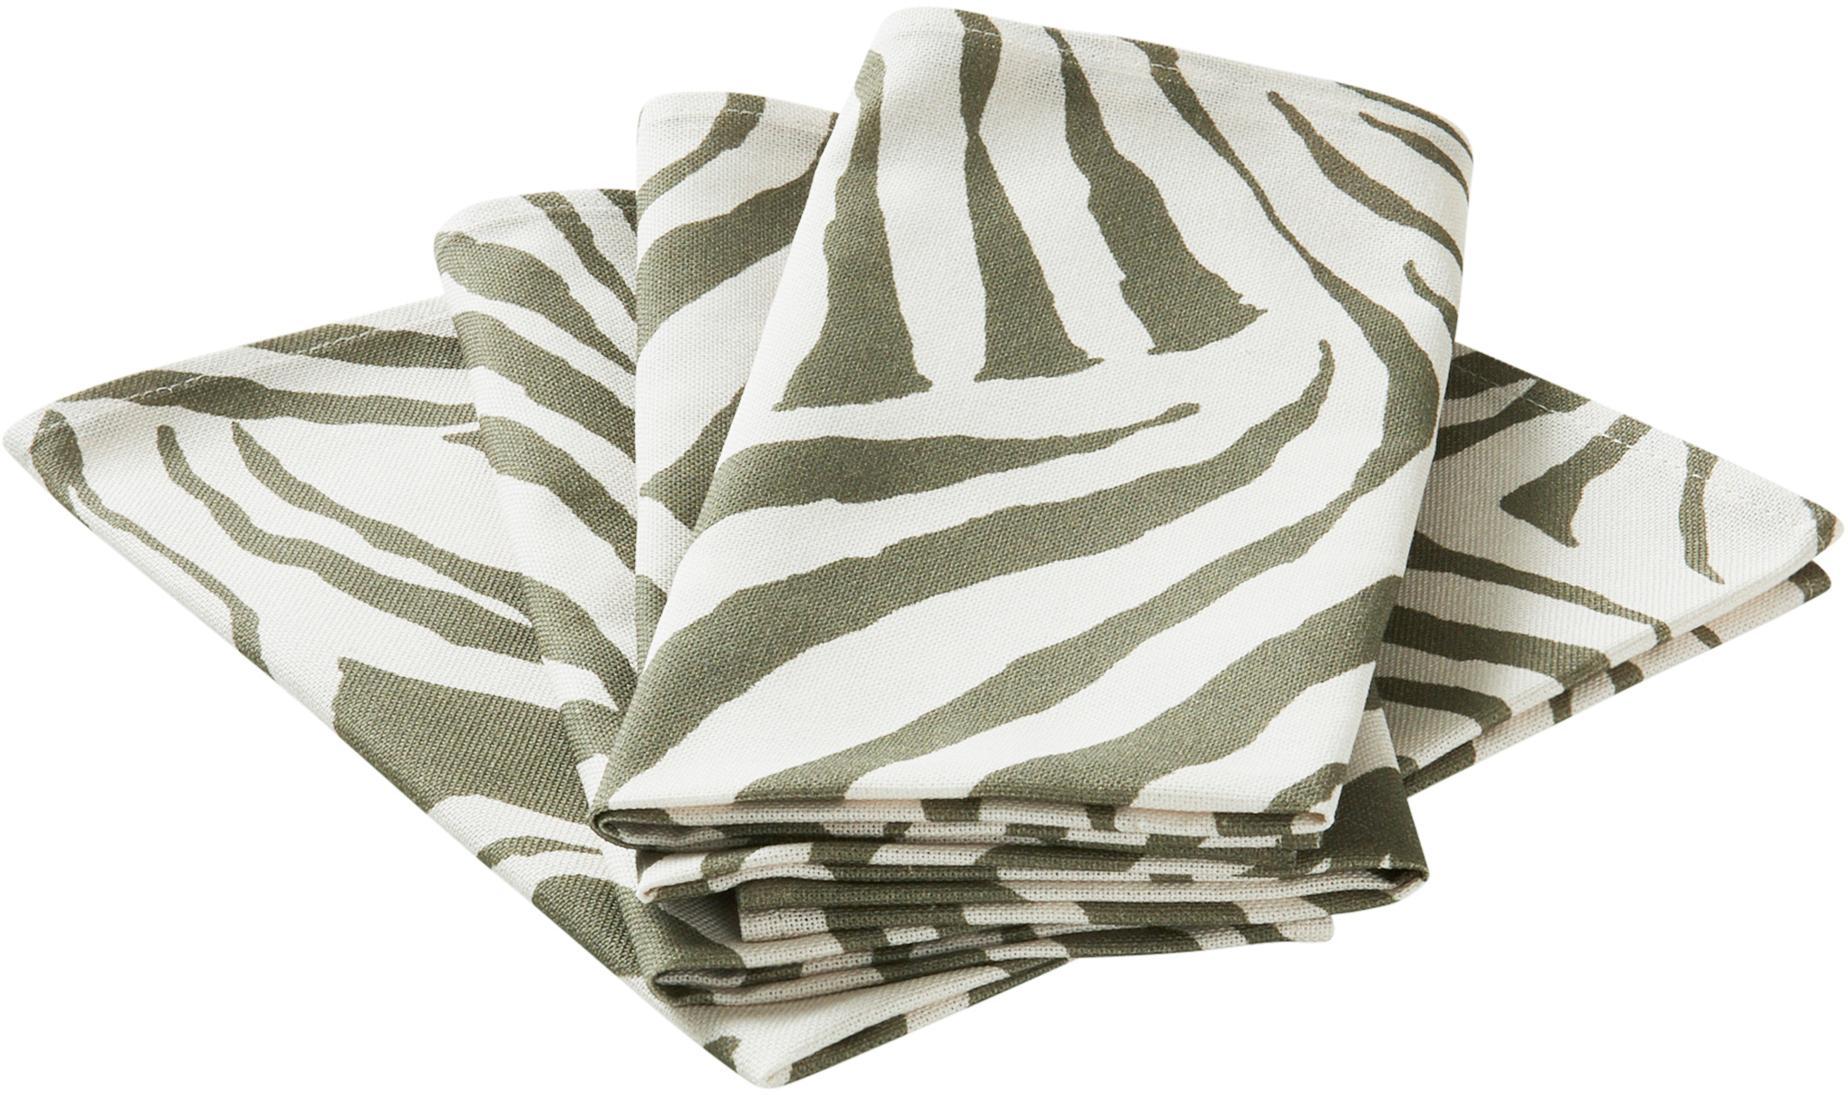 Katoenen servetten Zadie, 4 stuks, 100% katoen, afkomstig van duurzame katoenteelt, Olijfgroen, crèmewit, 45 x 45 cm